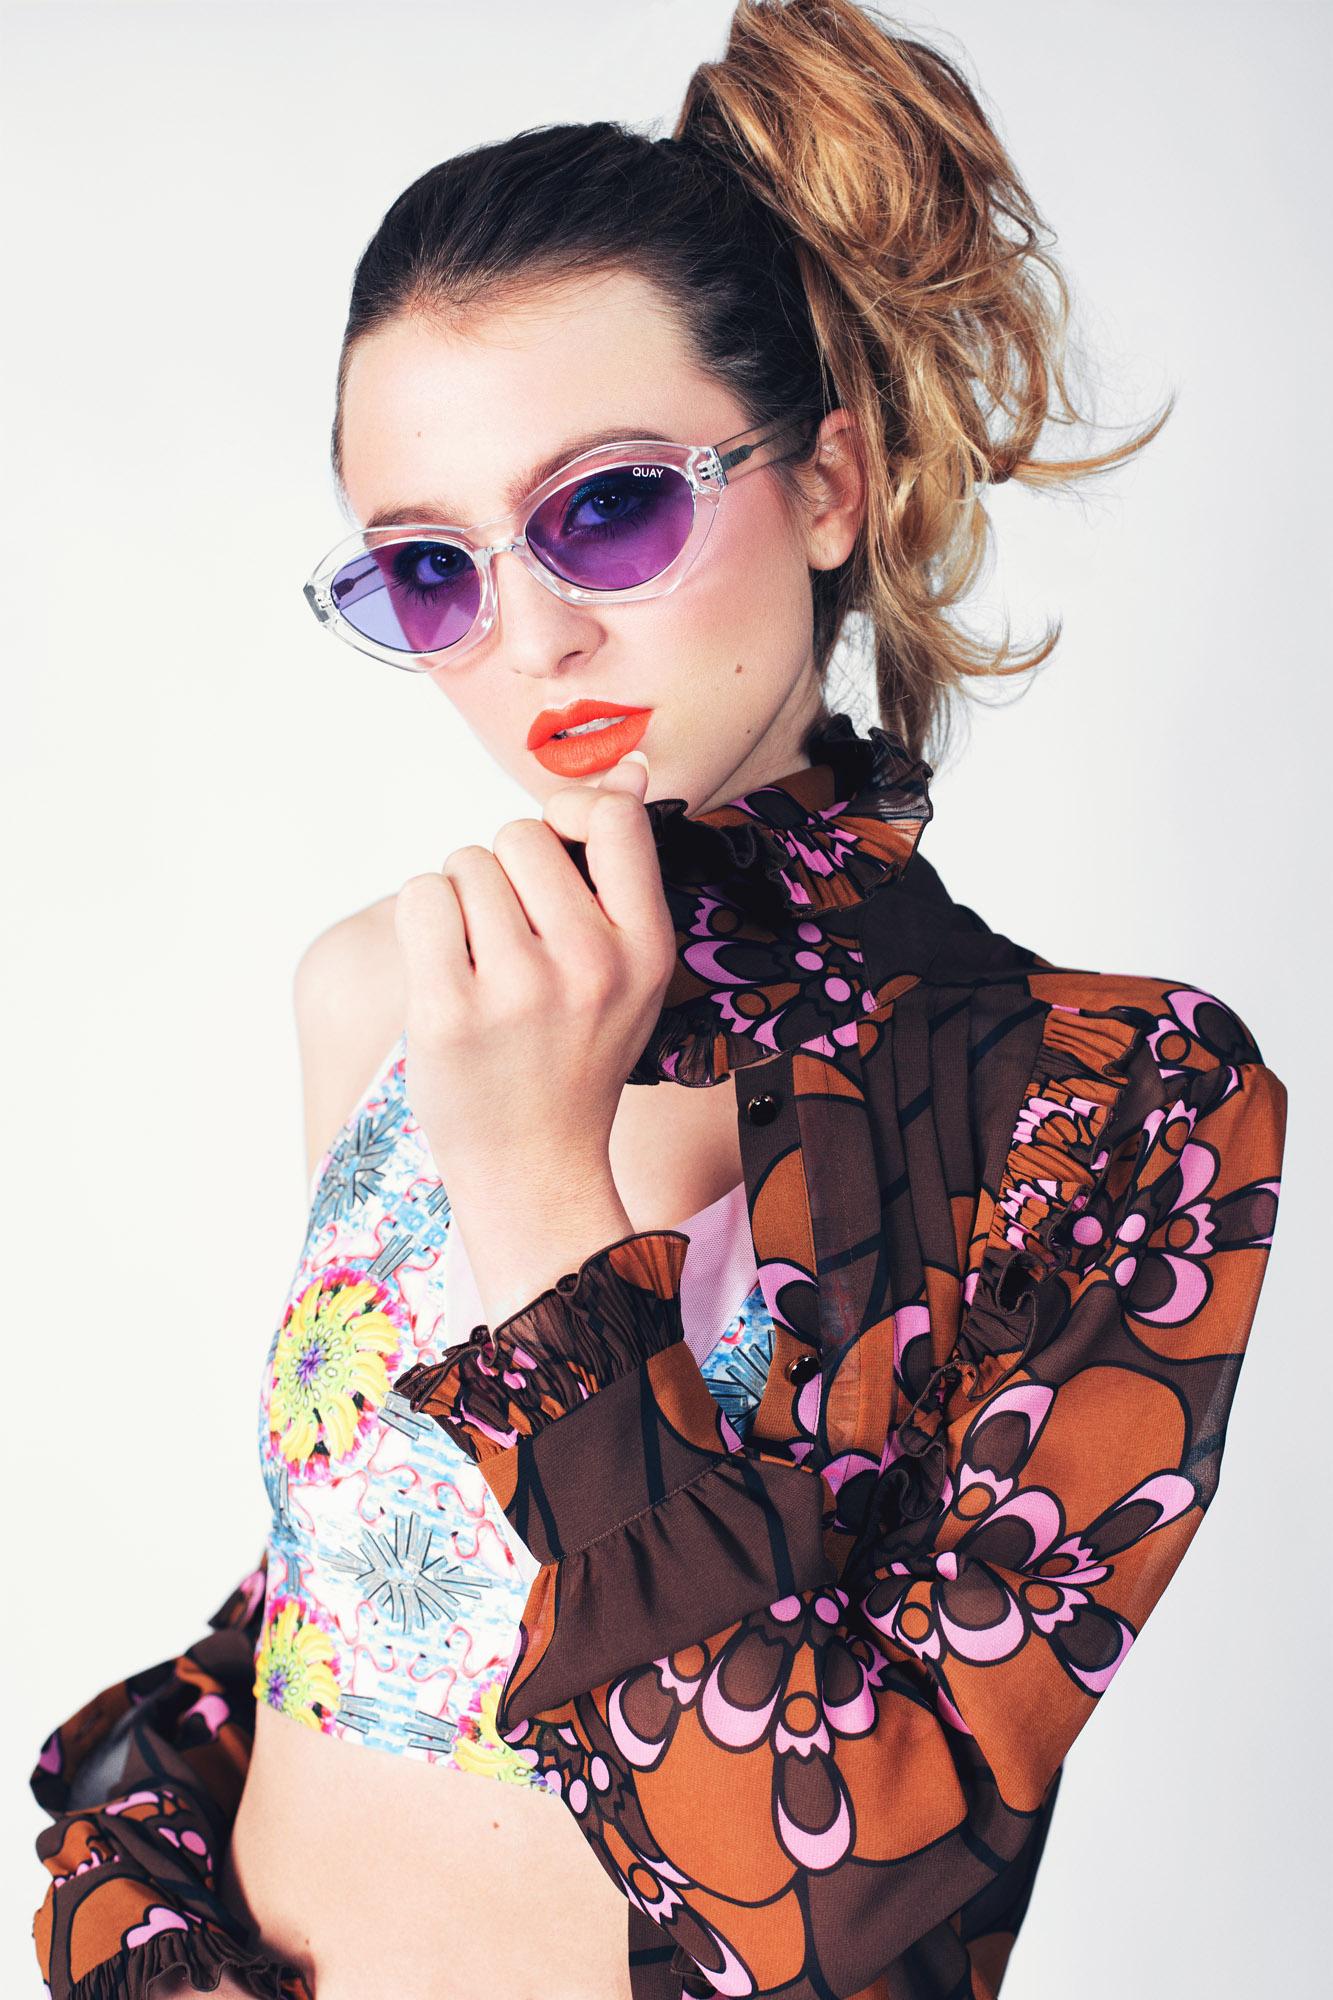 Phoebe Wright wears Crop Top: ADOSMANOS,Skirt: CAITLIN CHARLES-JONES, Shirt: ORLA KIELY,Sunglasses: QUAY AUSTRALIA, Neckpiece: CIVILIAN LONDON Heels: KIM WANG